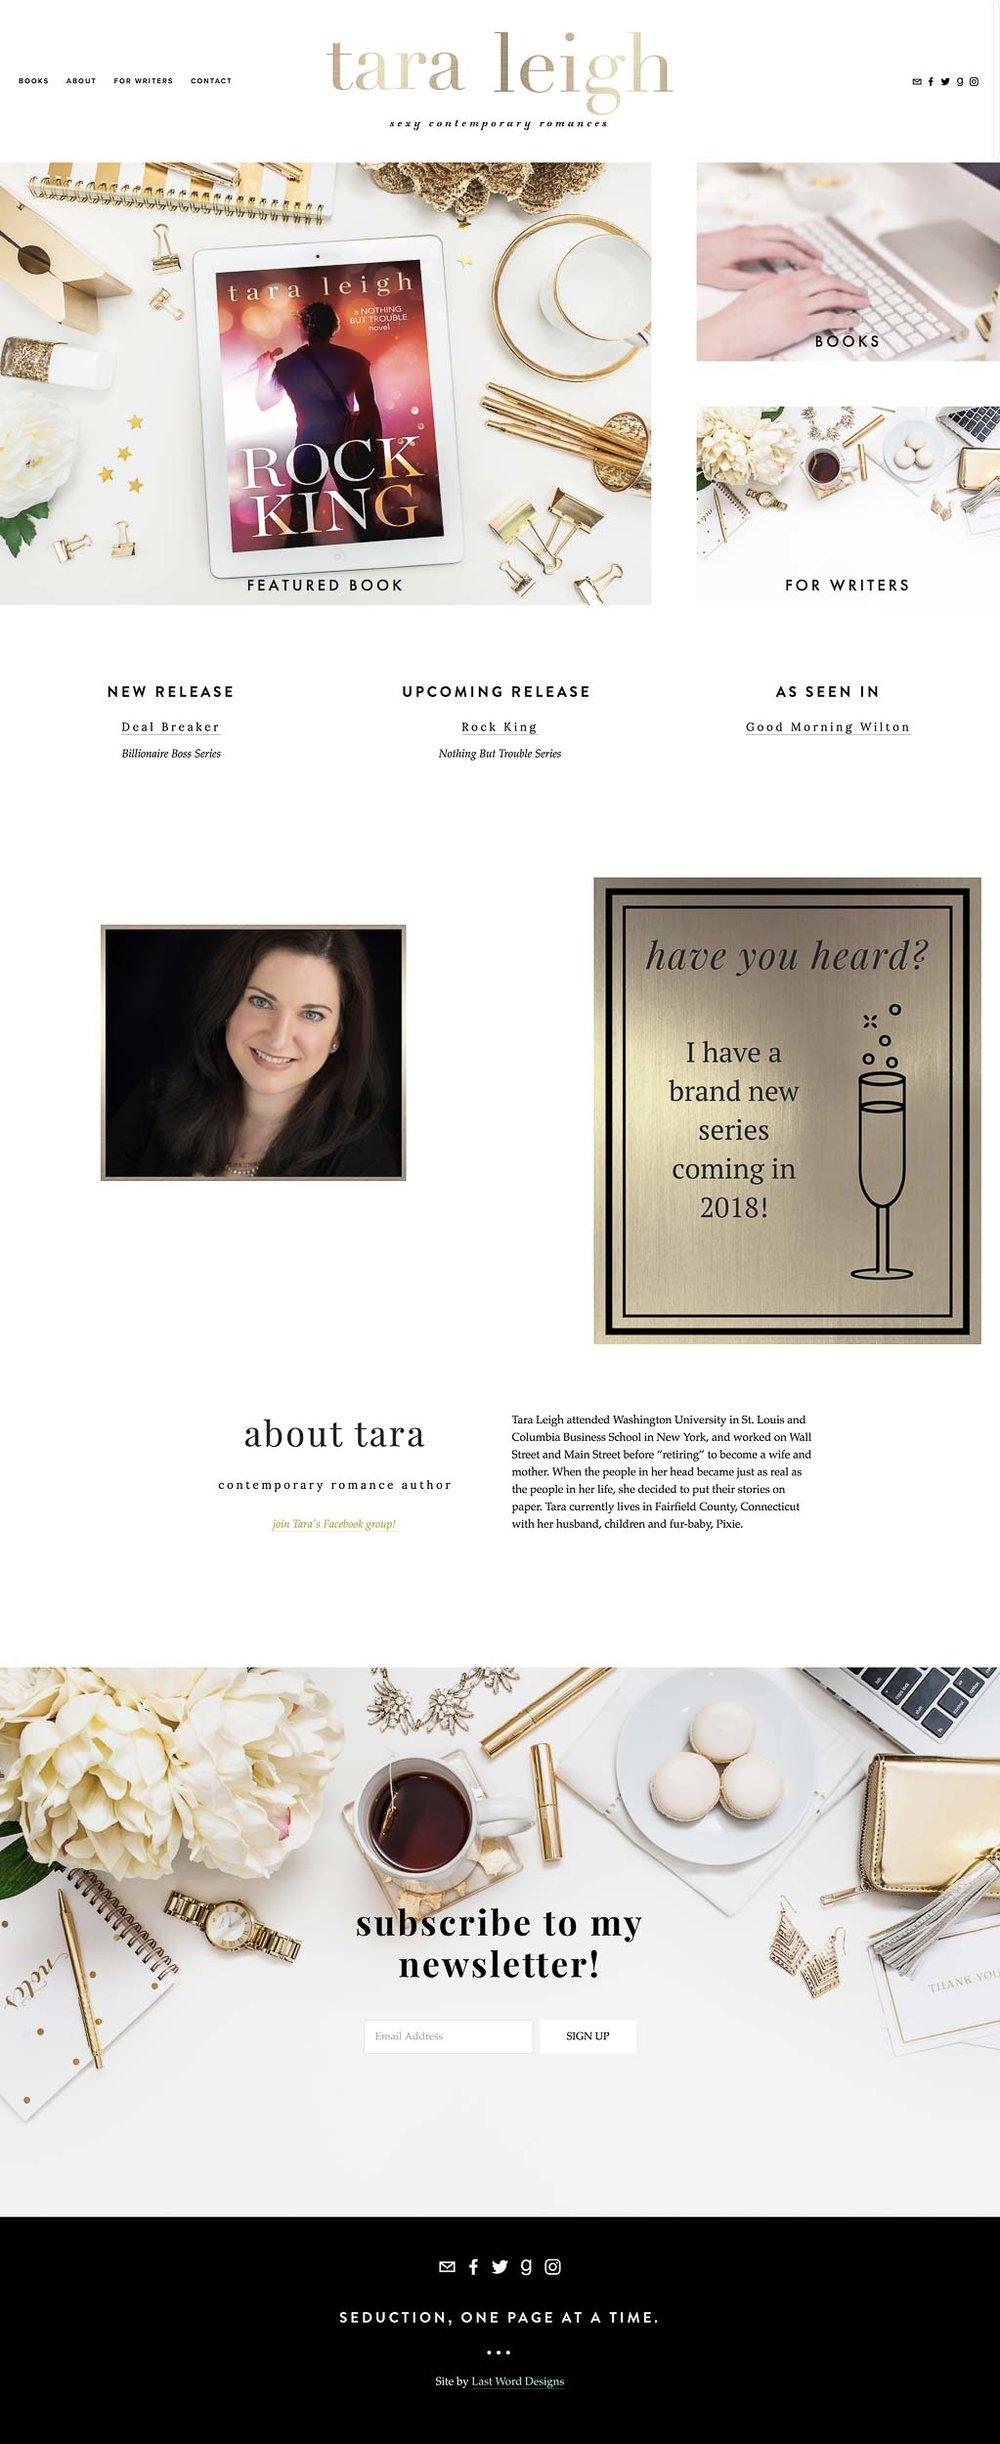 Last Word Designs Portfolio Tara Leigh - Squarespace.jpg